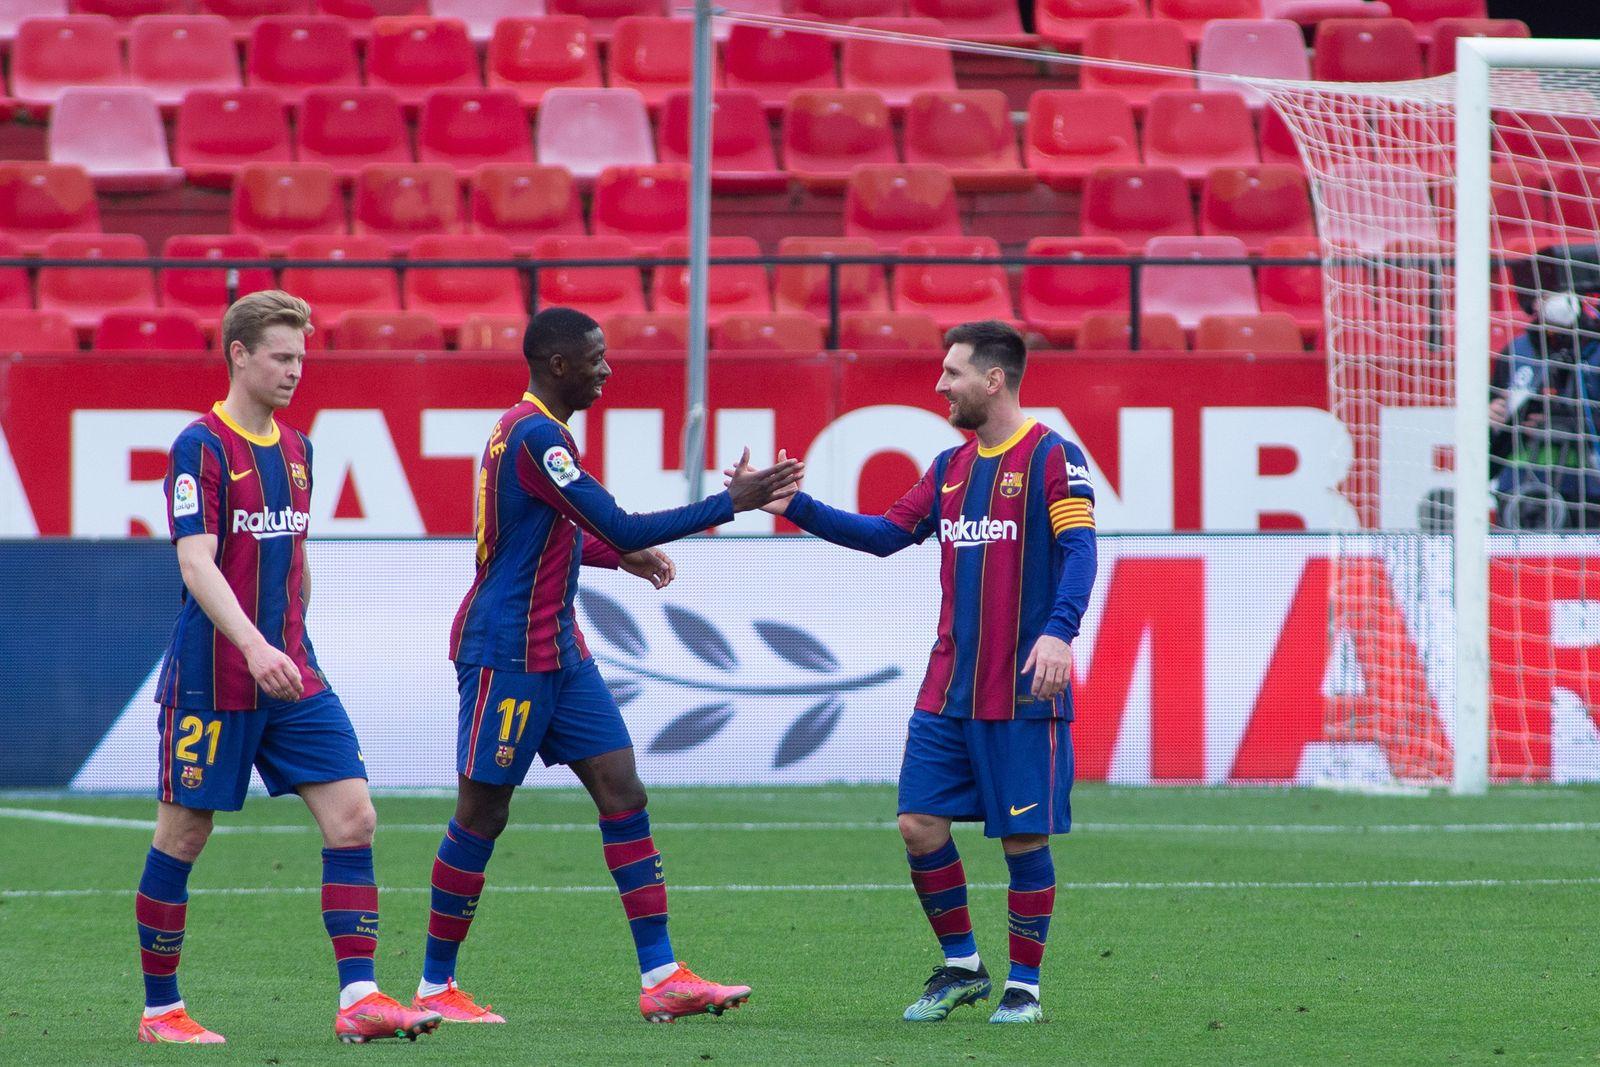 FOOTBALL - SPANISH CHAMP - SEVILLA FC v FC BARCELONA